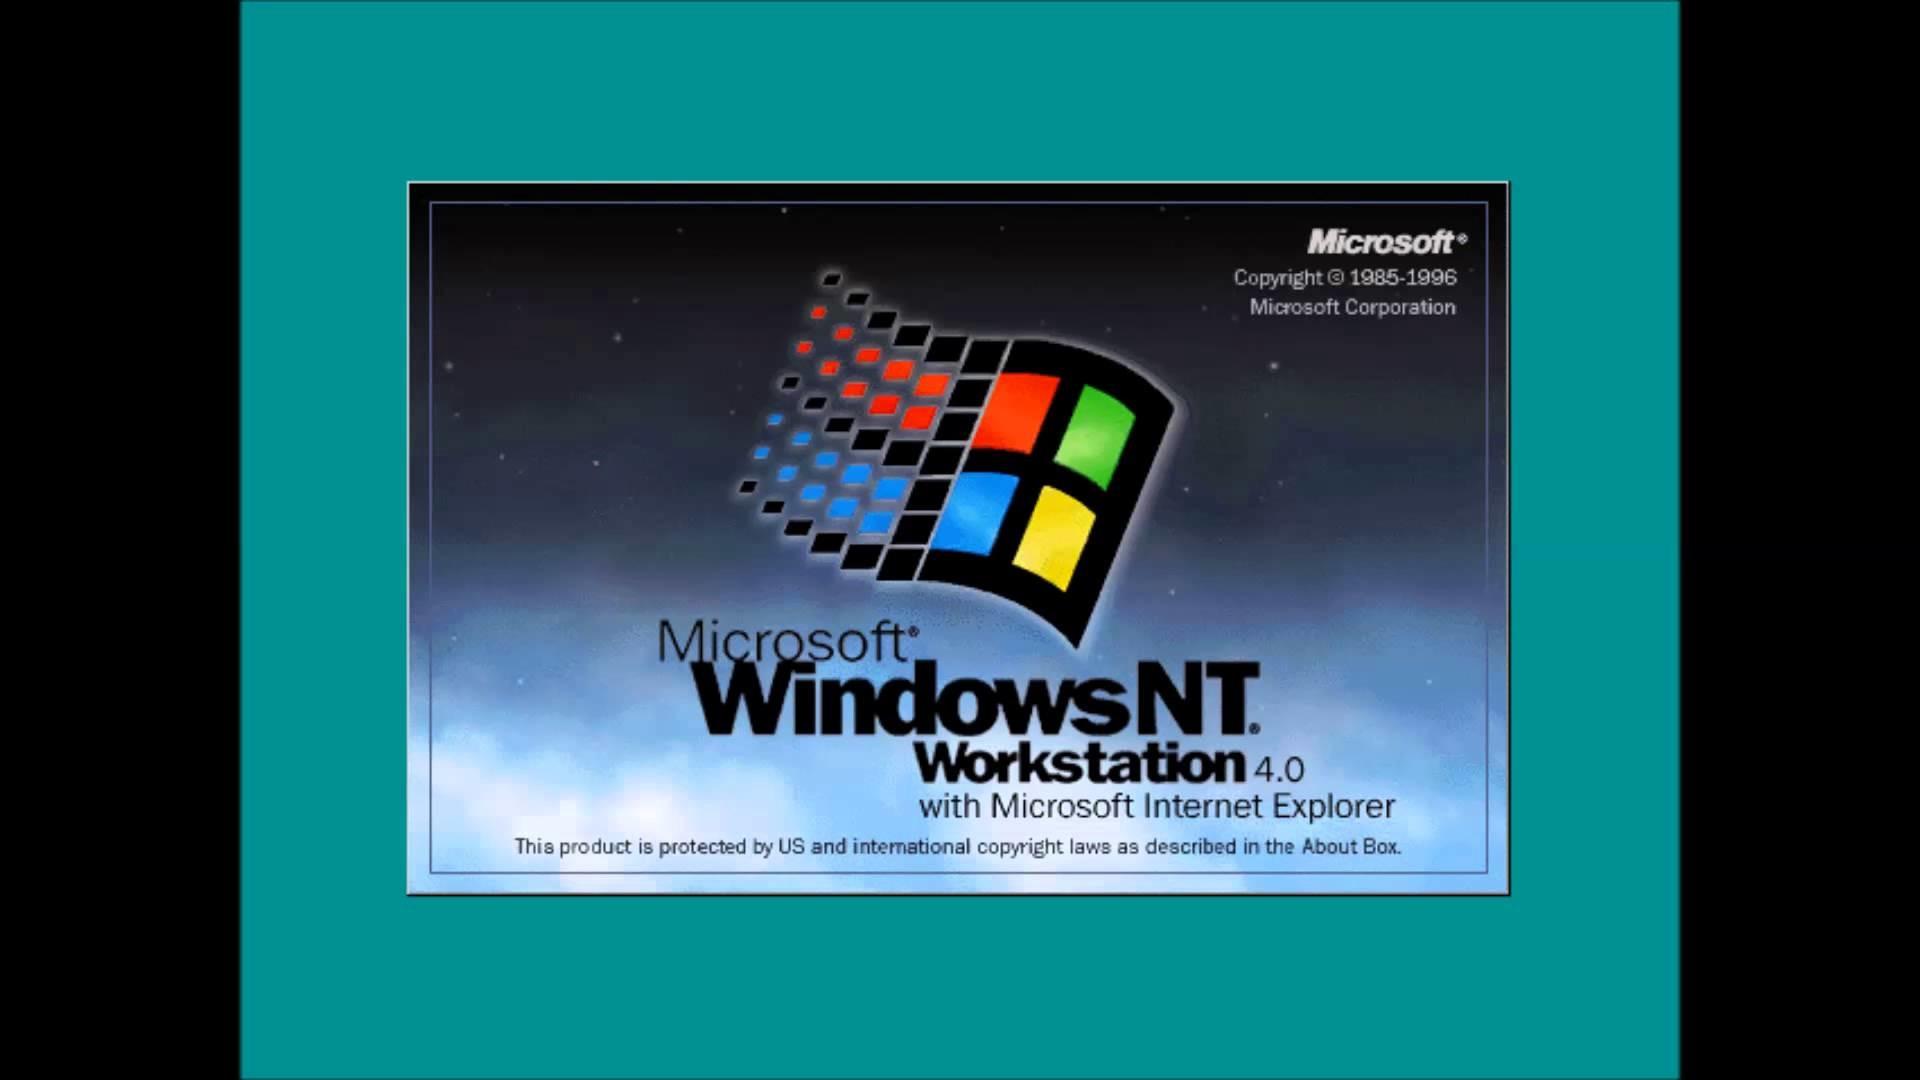 Windows NT 4.0 Shutdown Sound